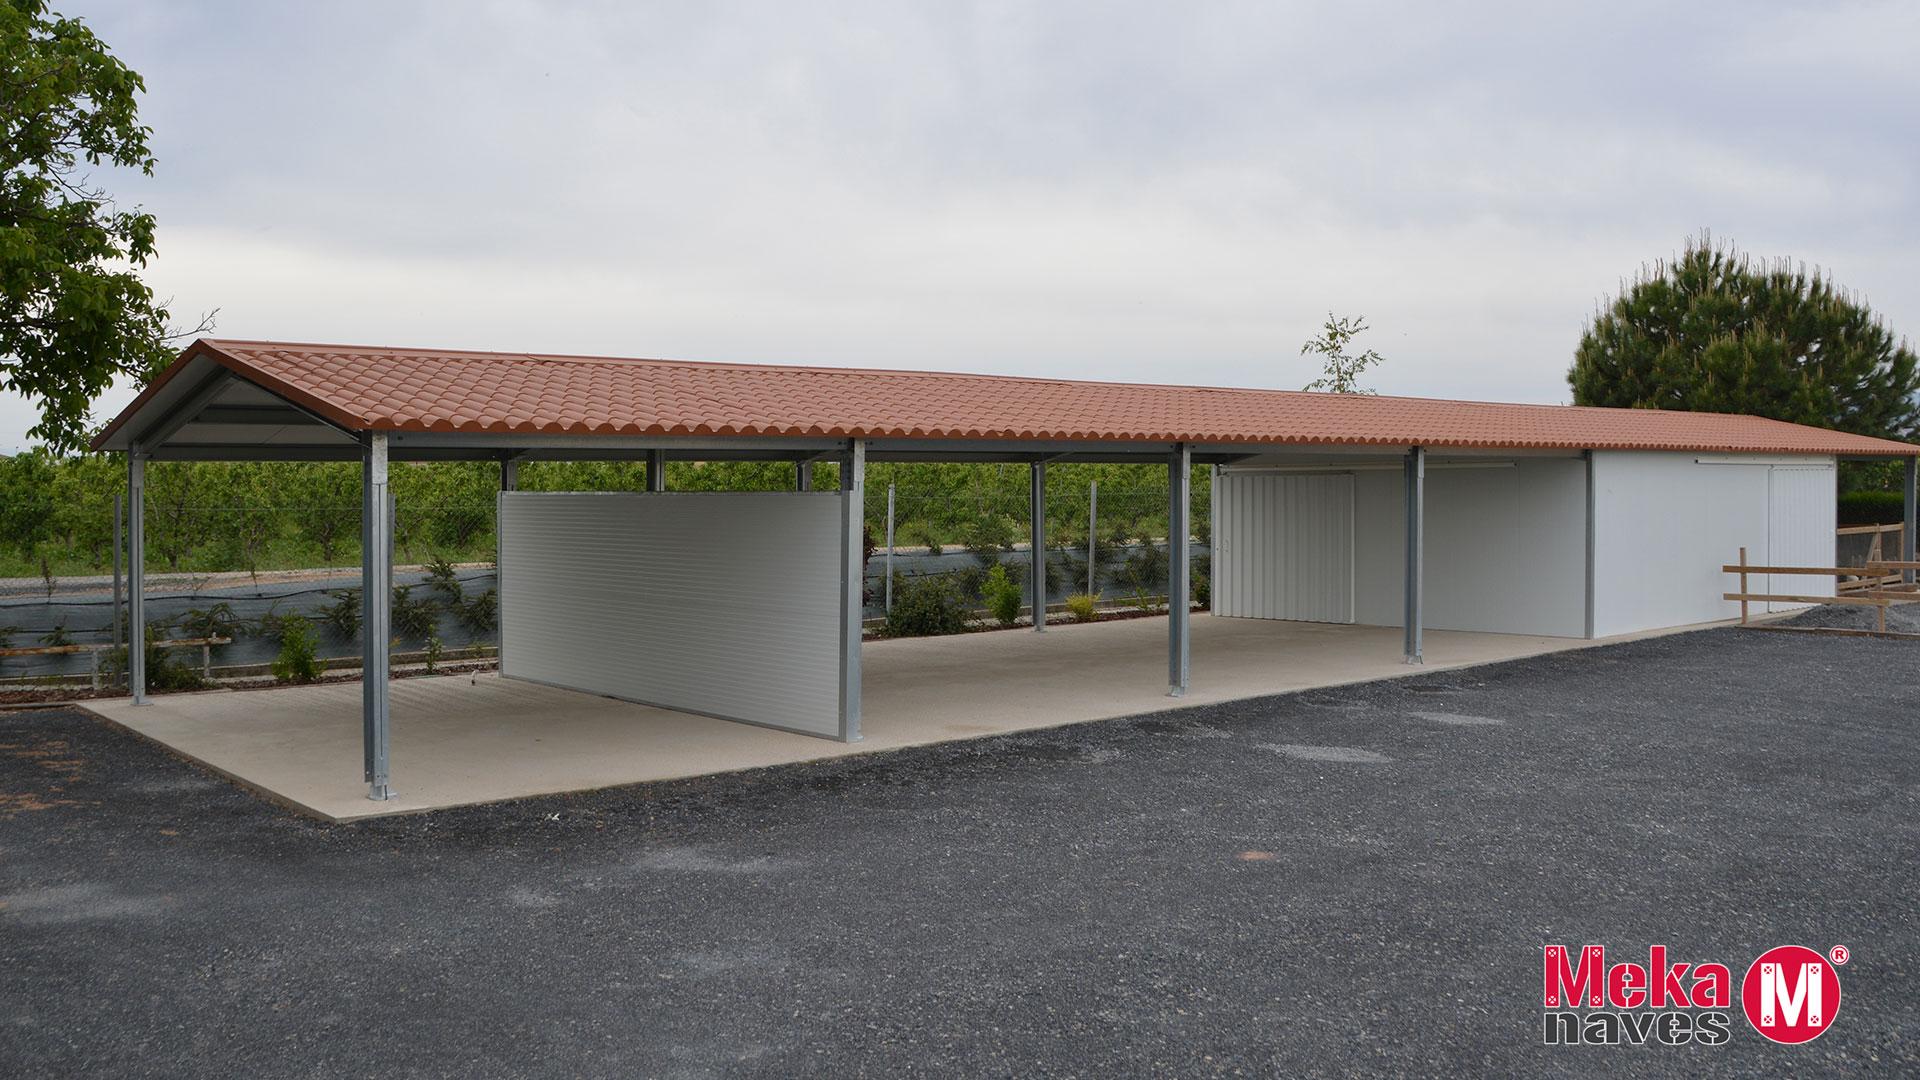 Mekanave concepto modular destinada al ocio en la rioja for Residencia canina la rioja